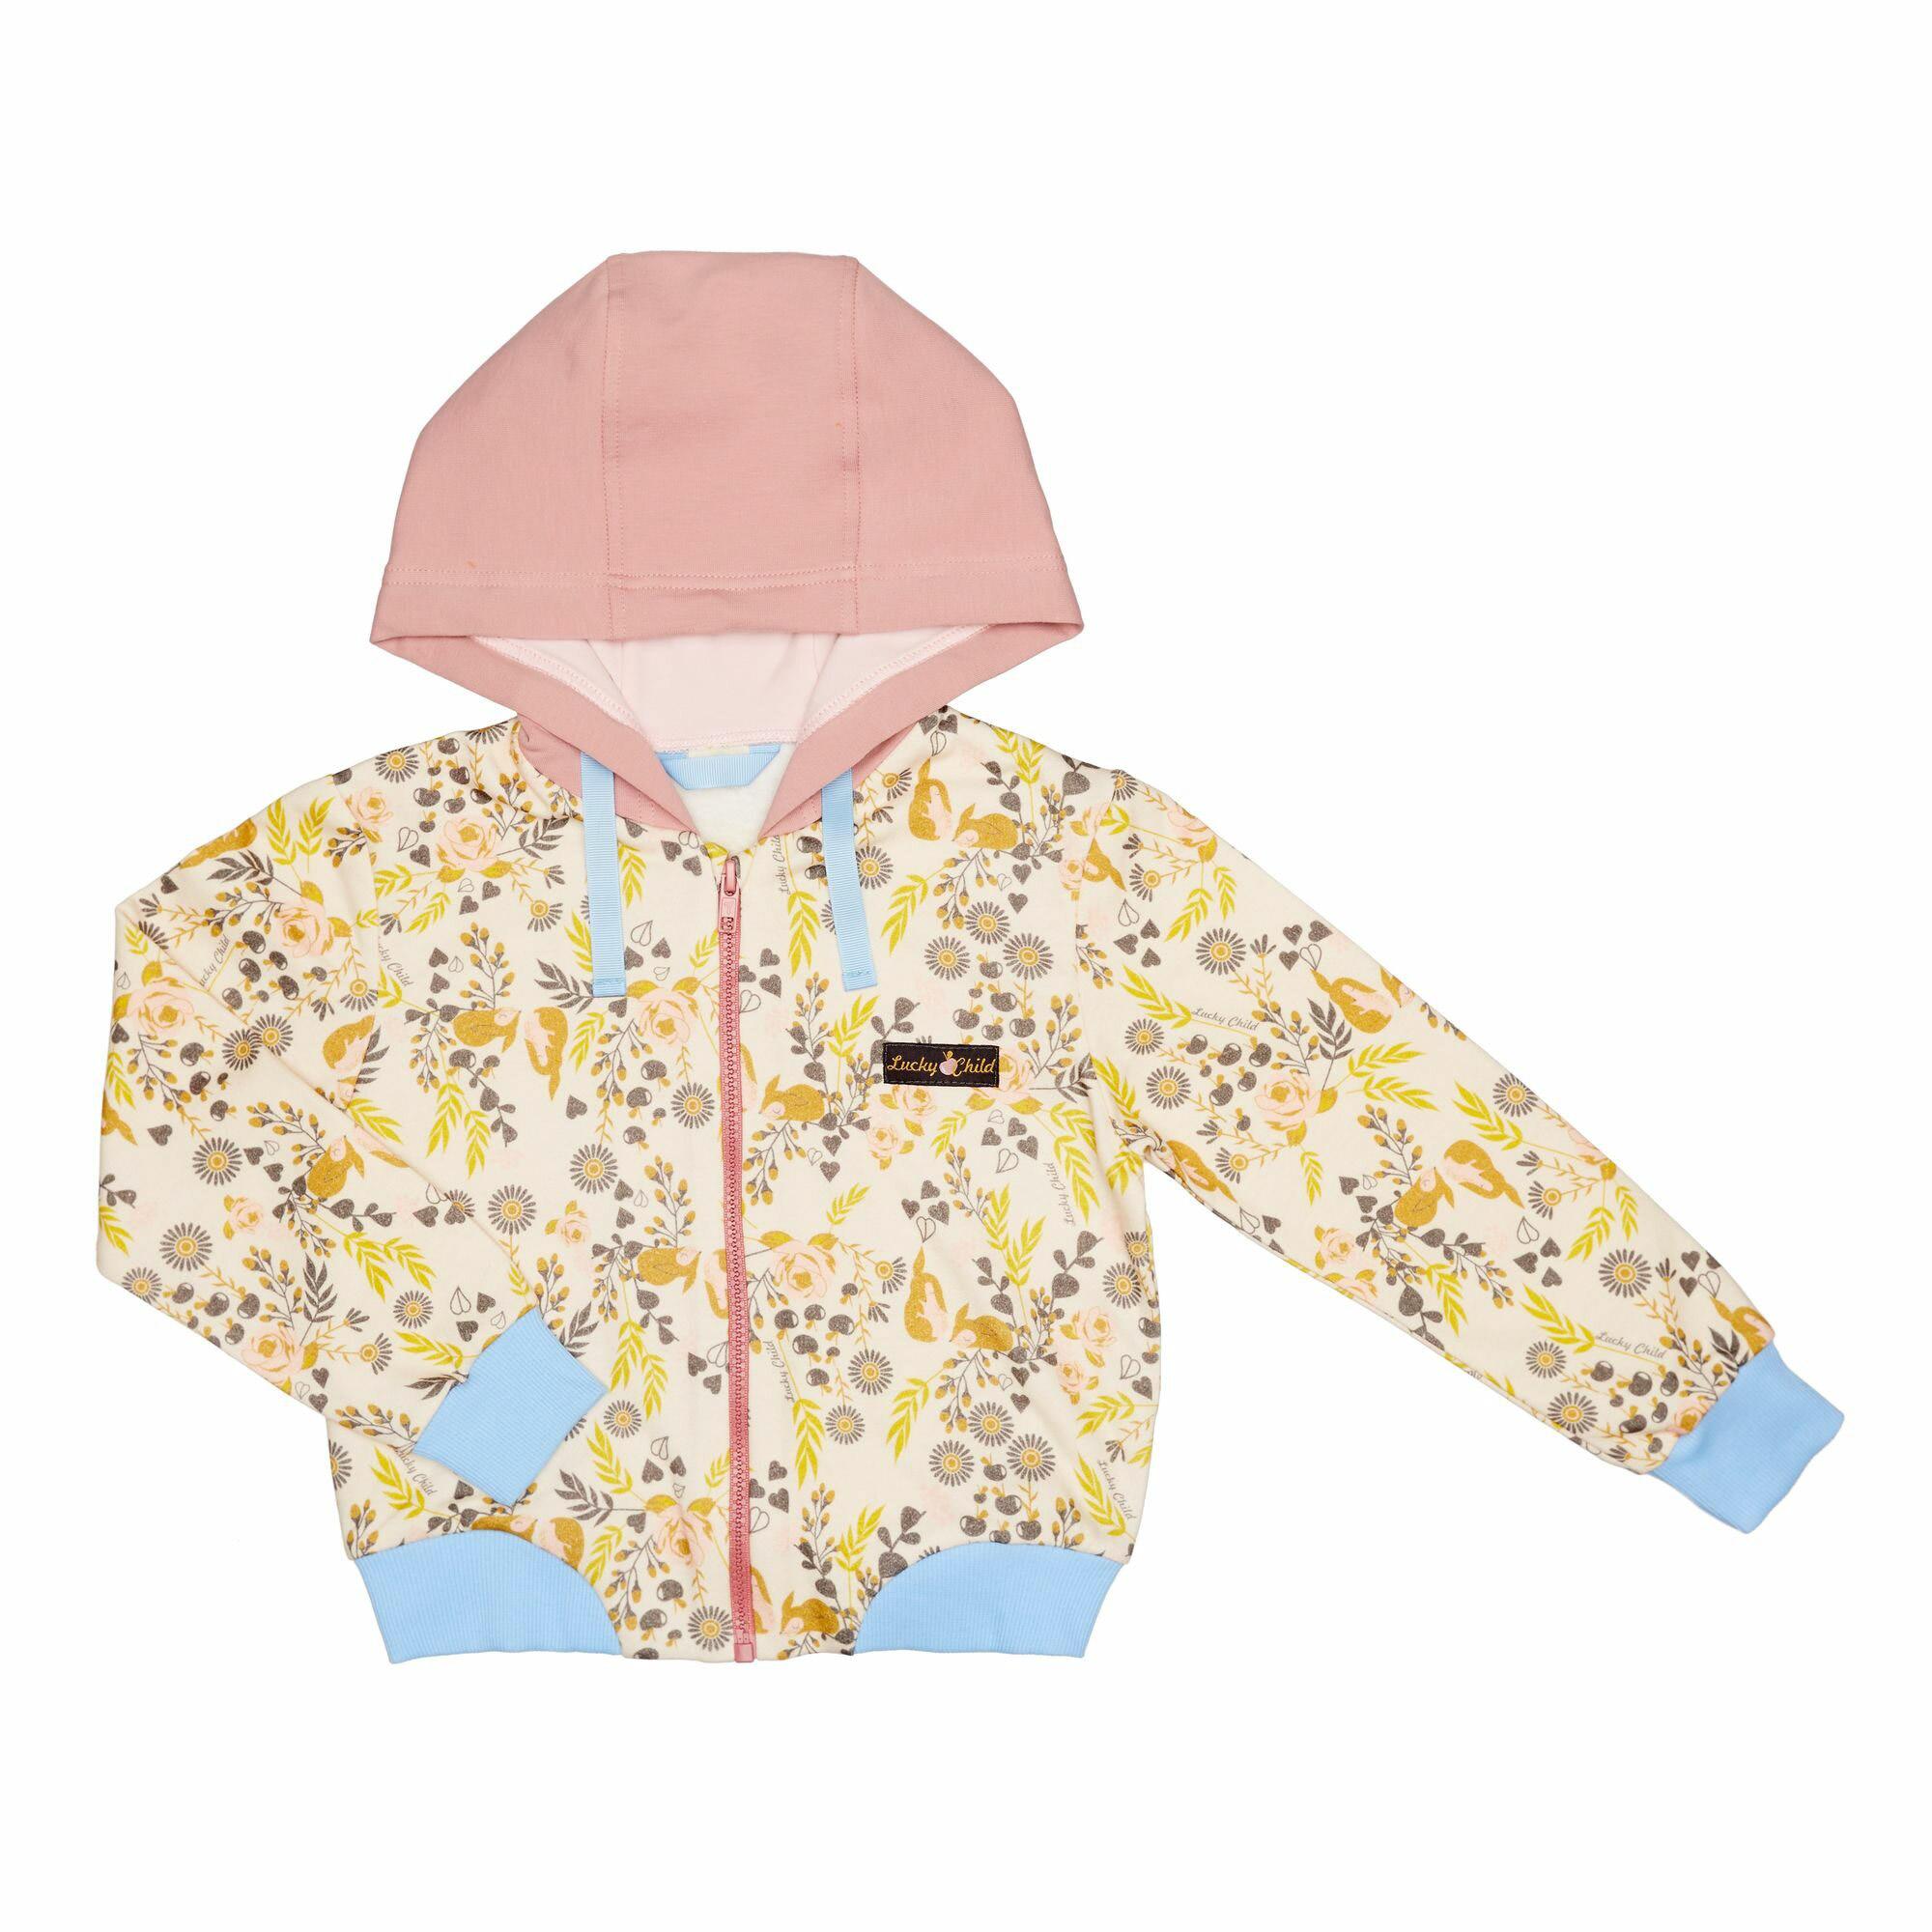 Куртка Lucky Child  Осенний лес цветная 122-128